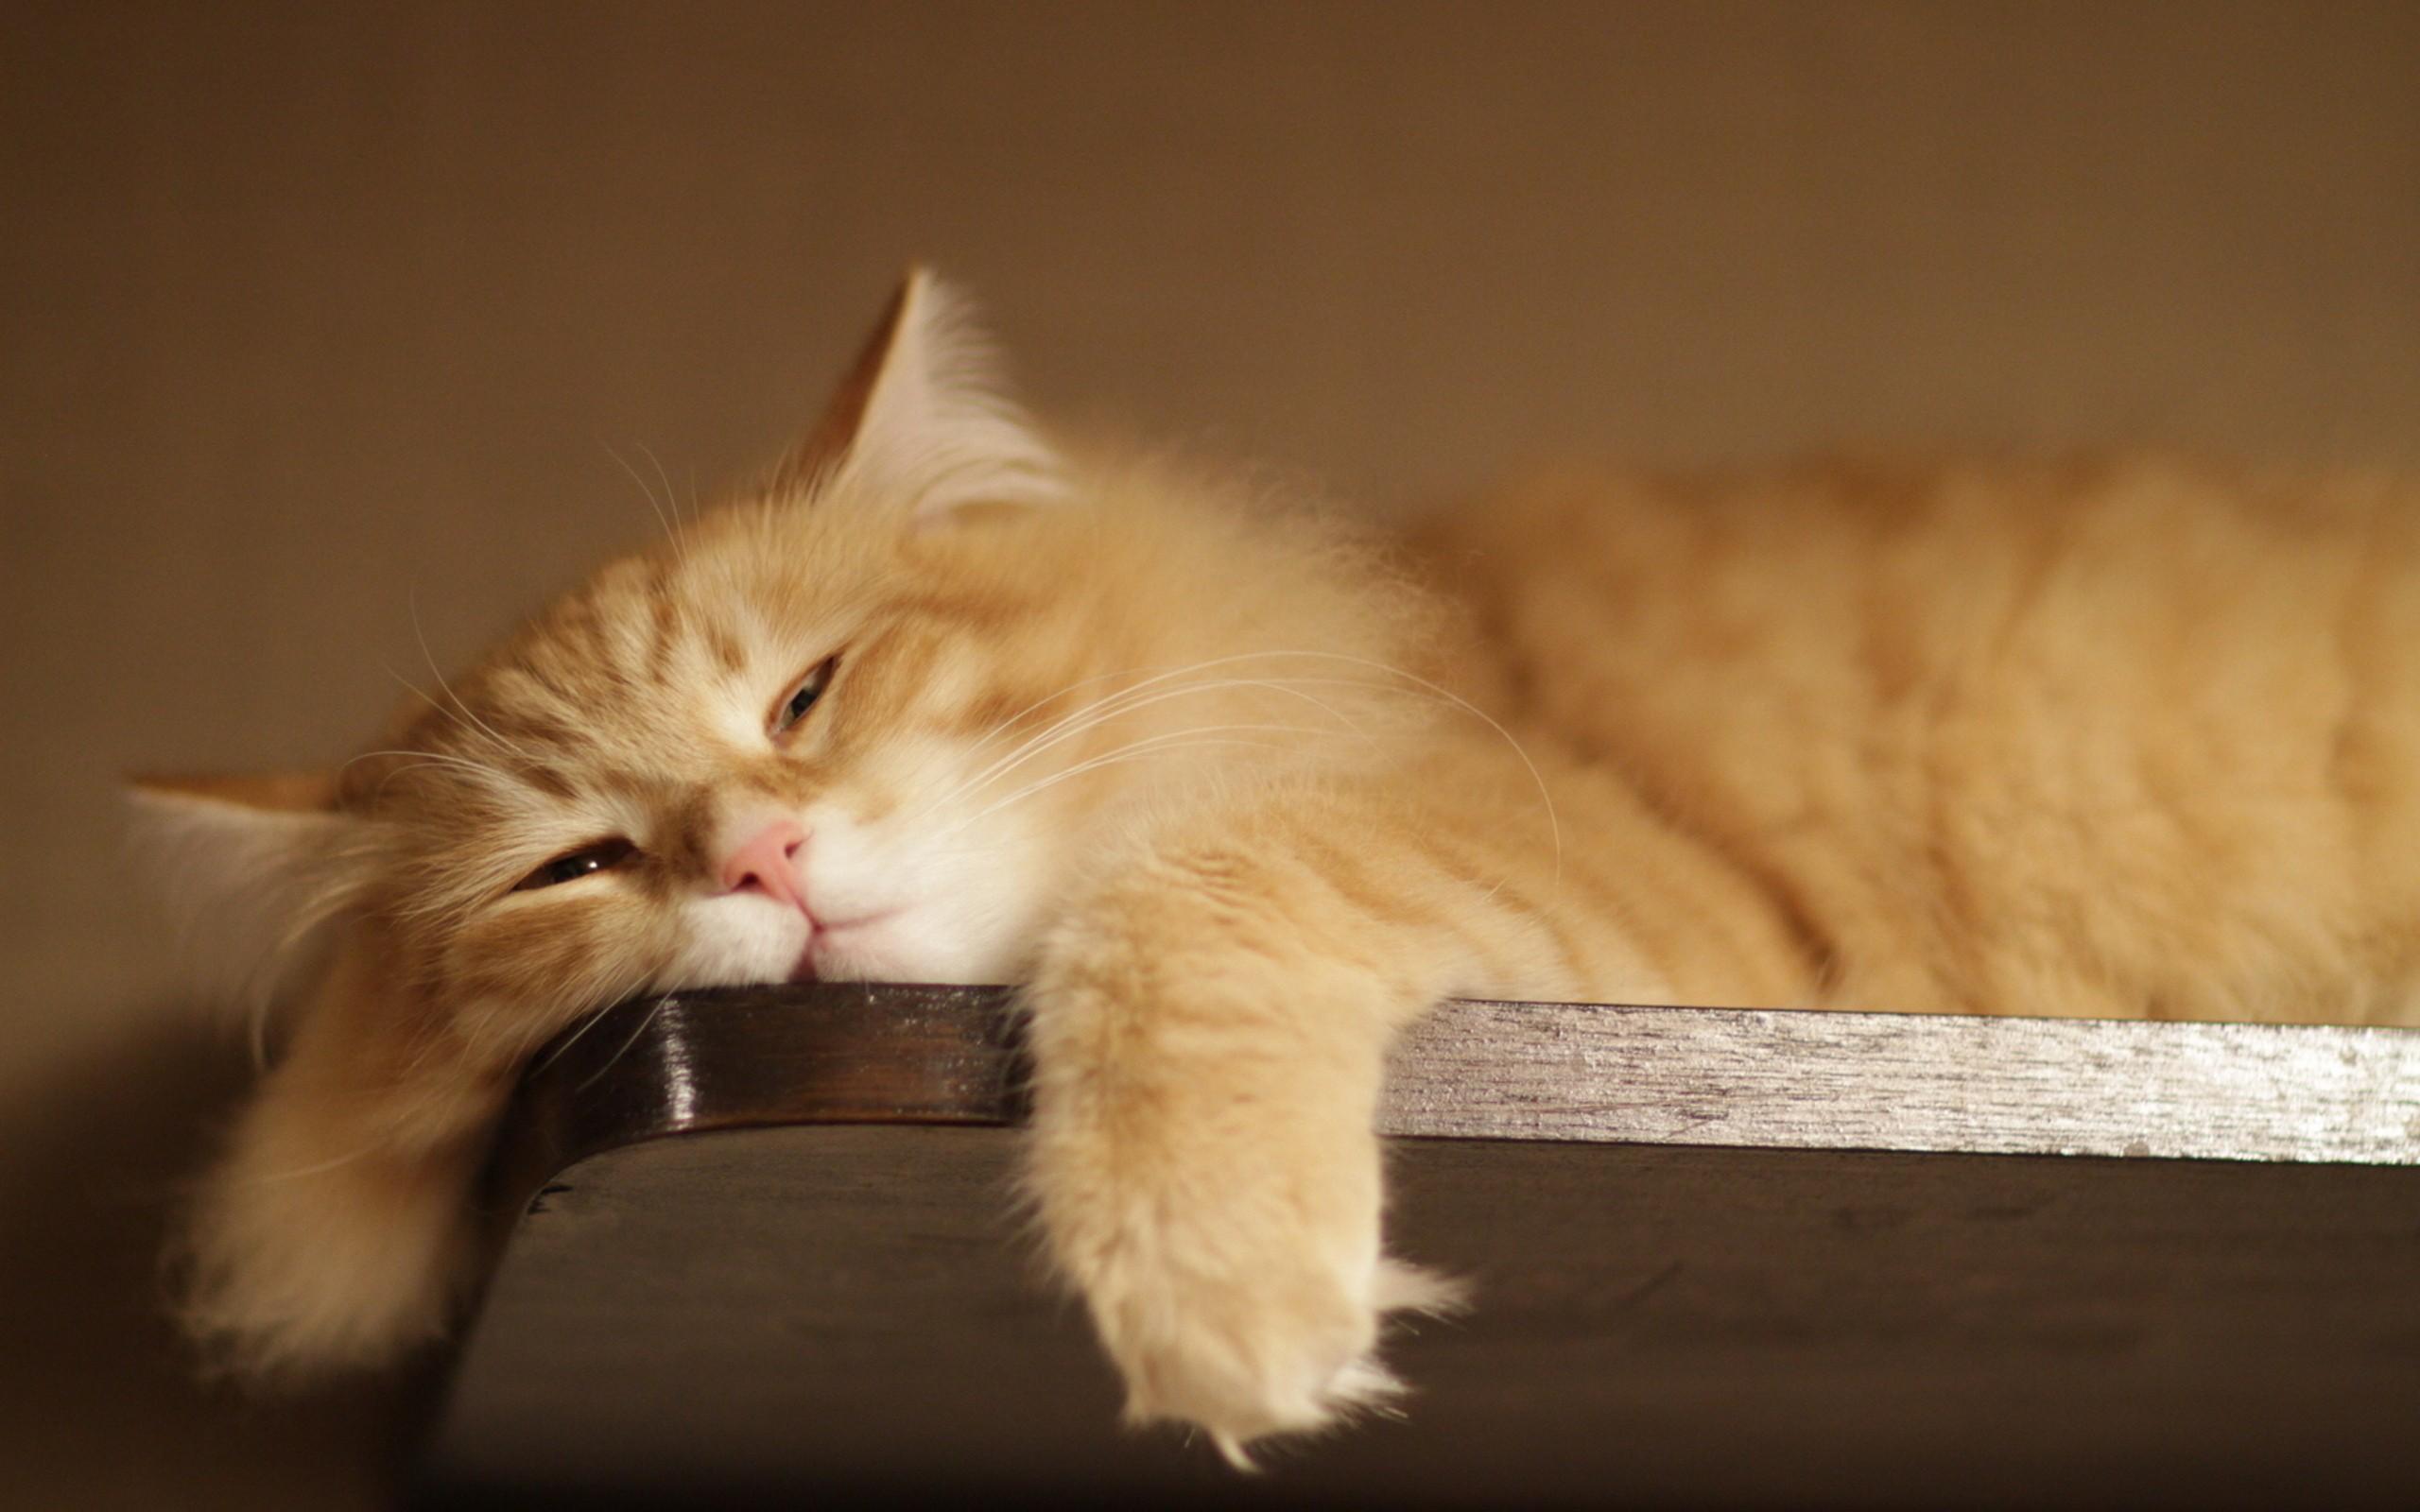 Un gato perezoso - 2560x1600